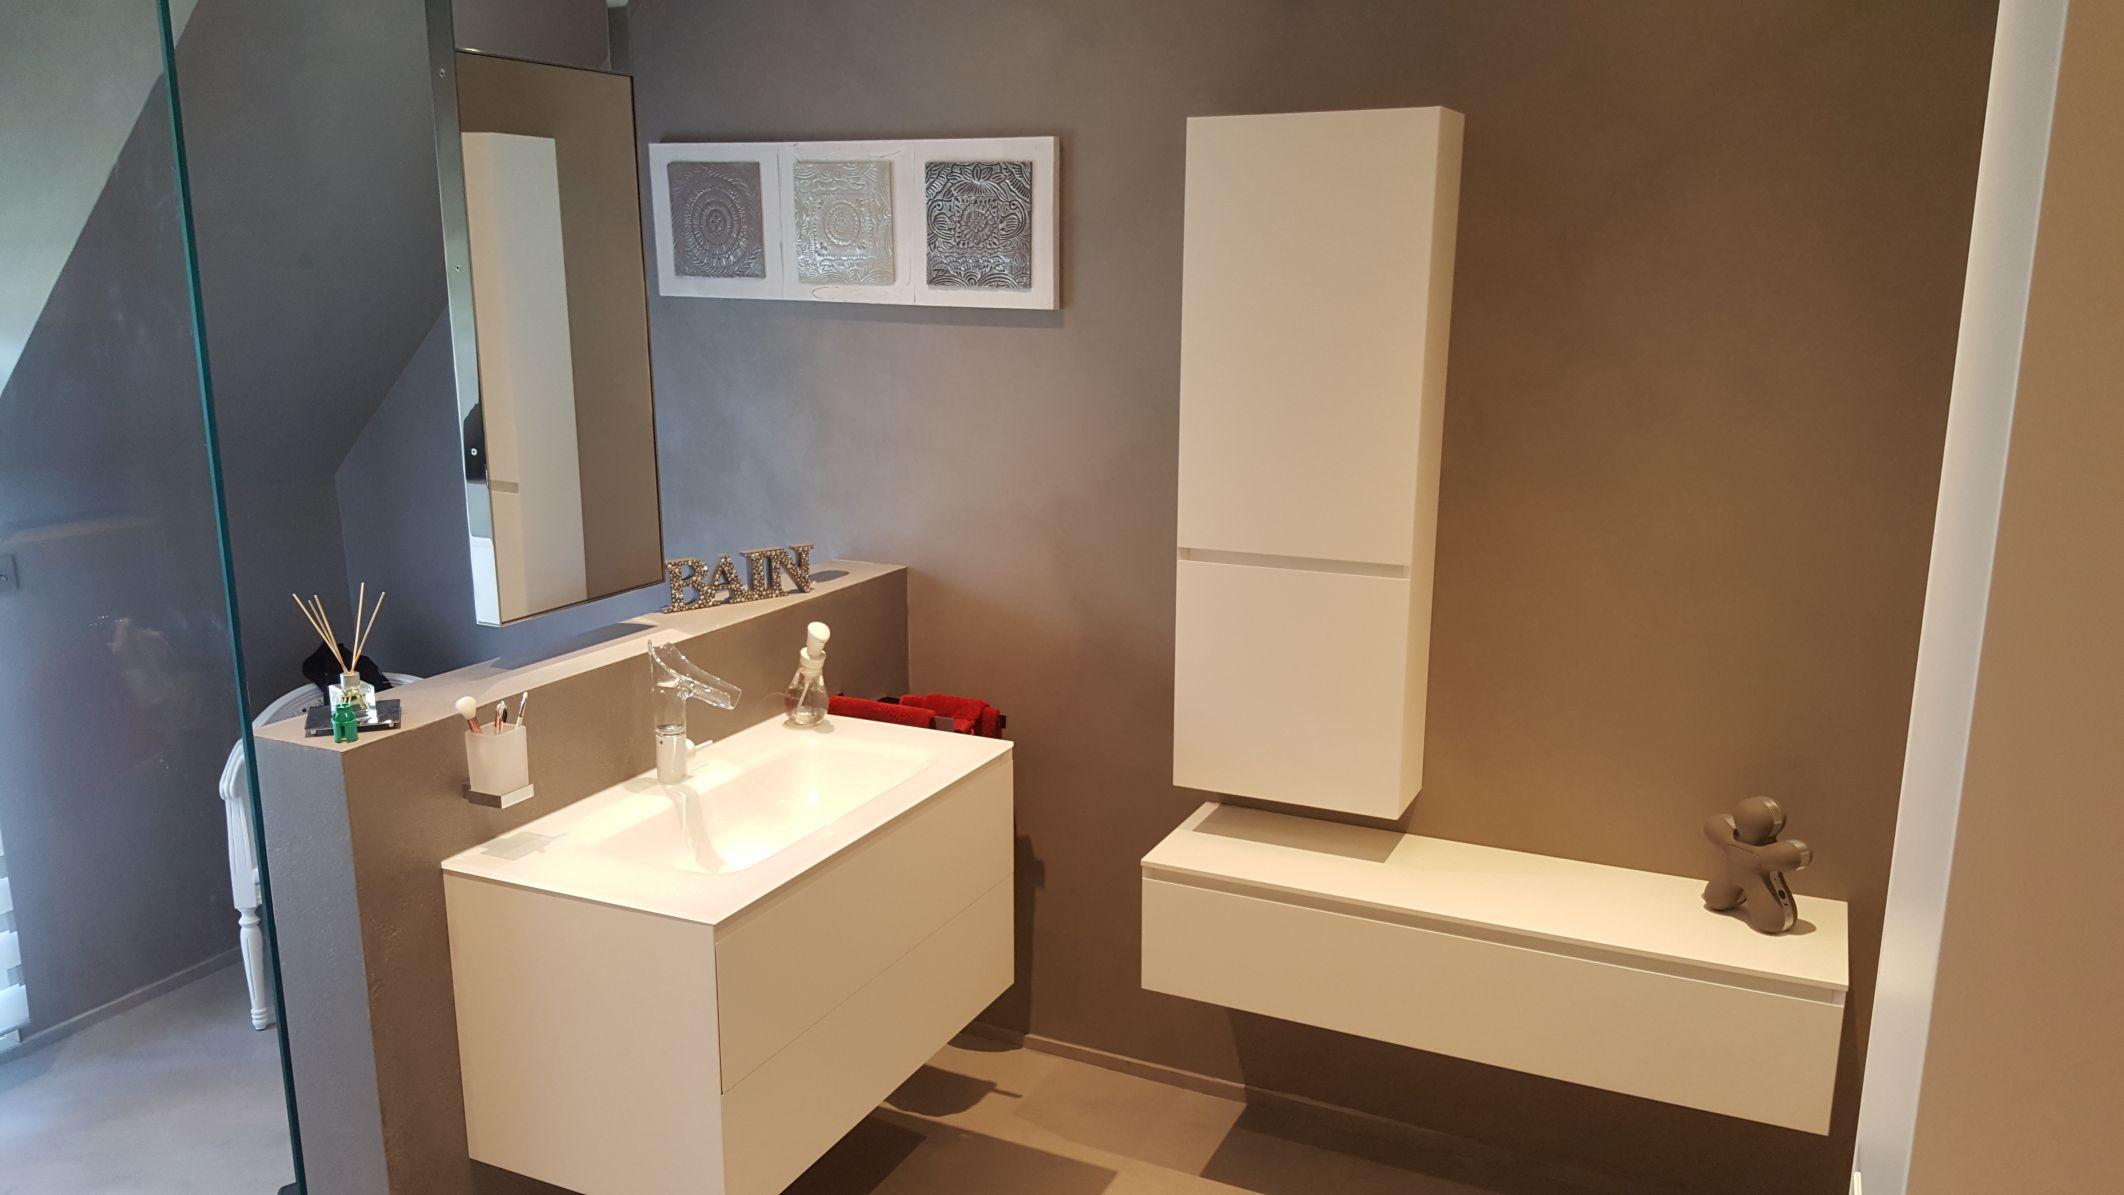 salle-de-bain-beton-cire-gris-miroir-suspendu